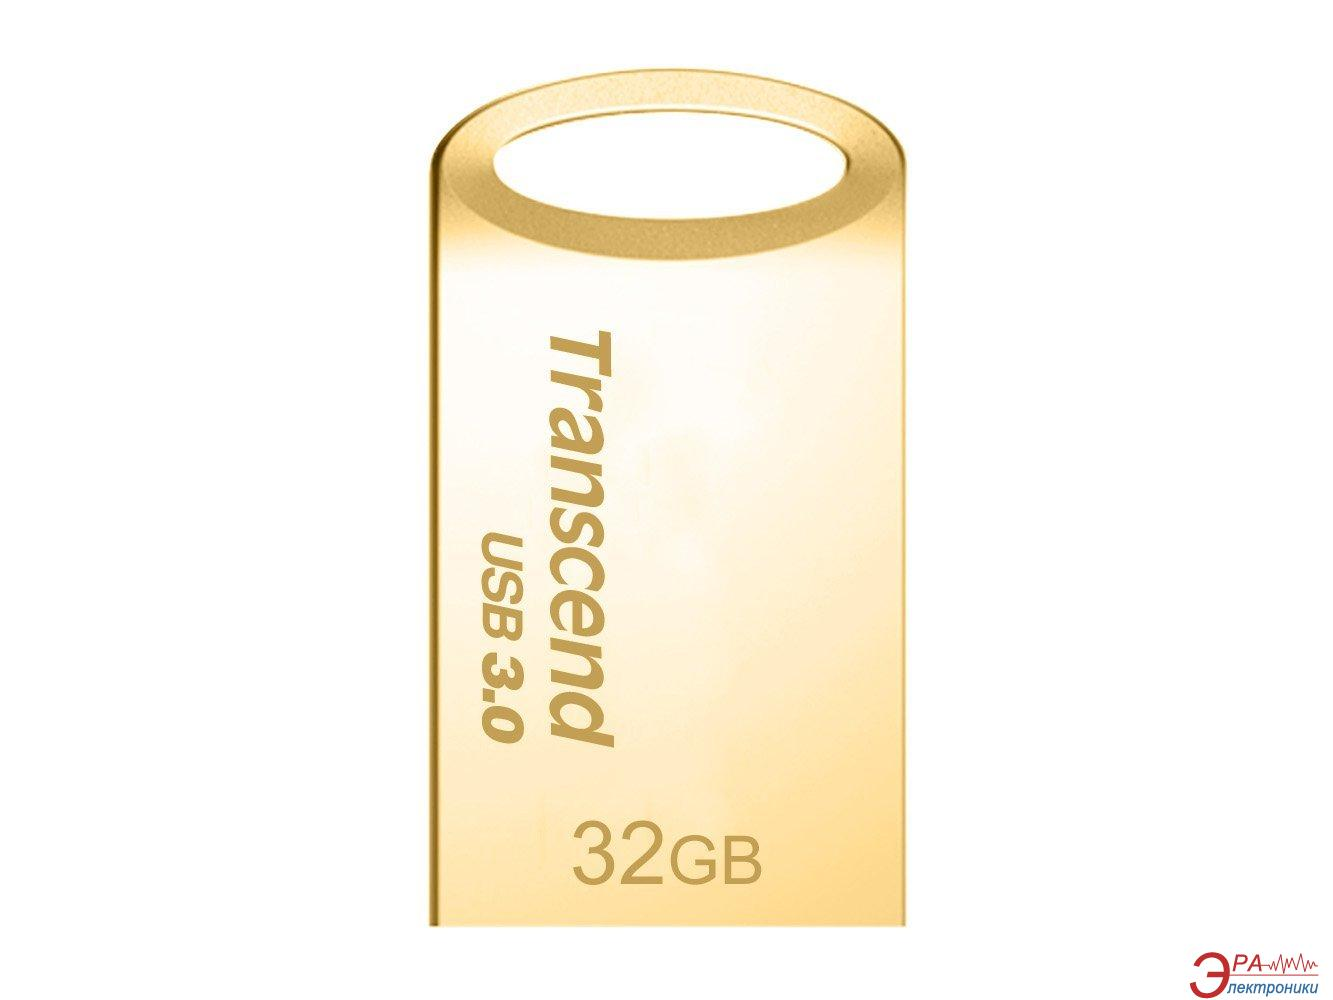 Флеш память USB 3.0 Transcend 32 Гб JetFlash 710 Metal Gold (TS32GJF710G)